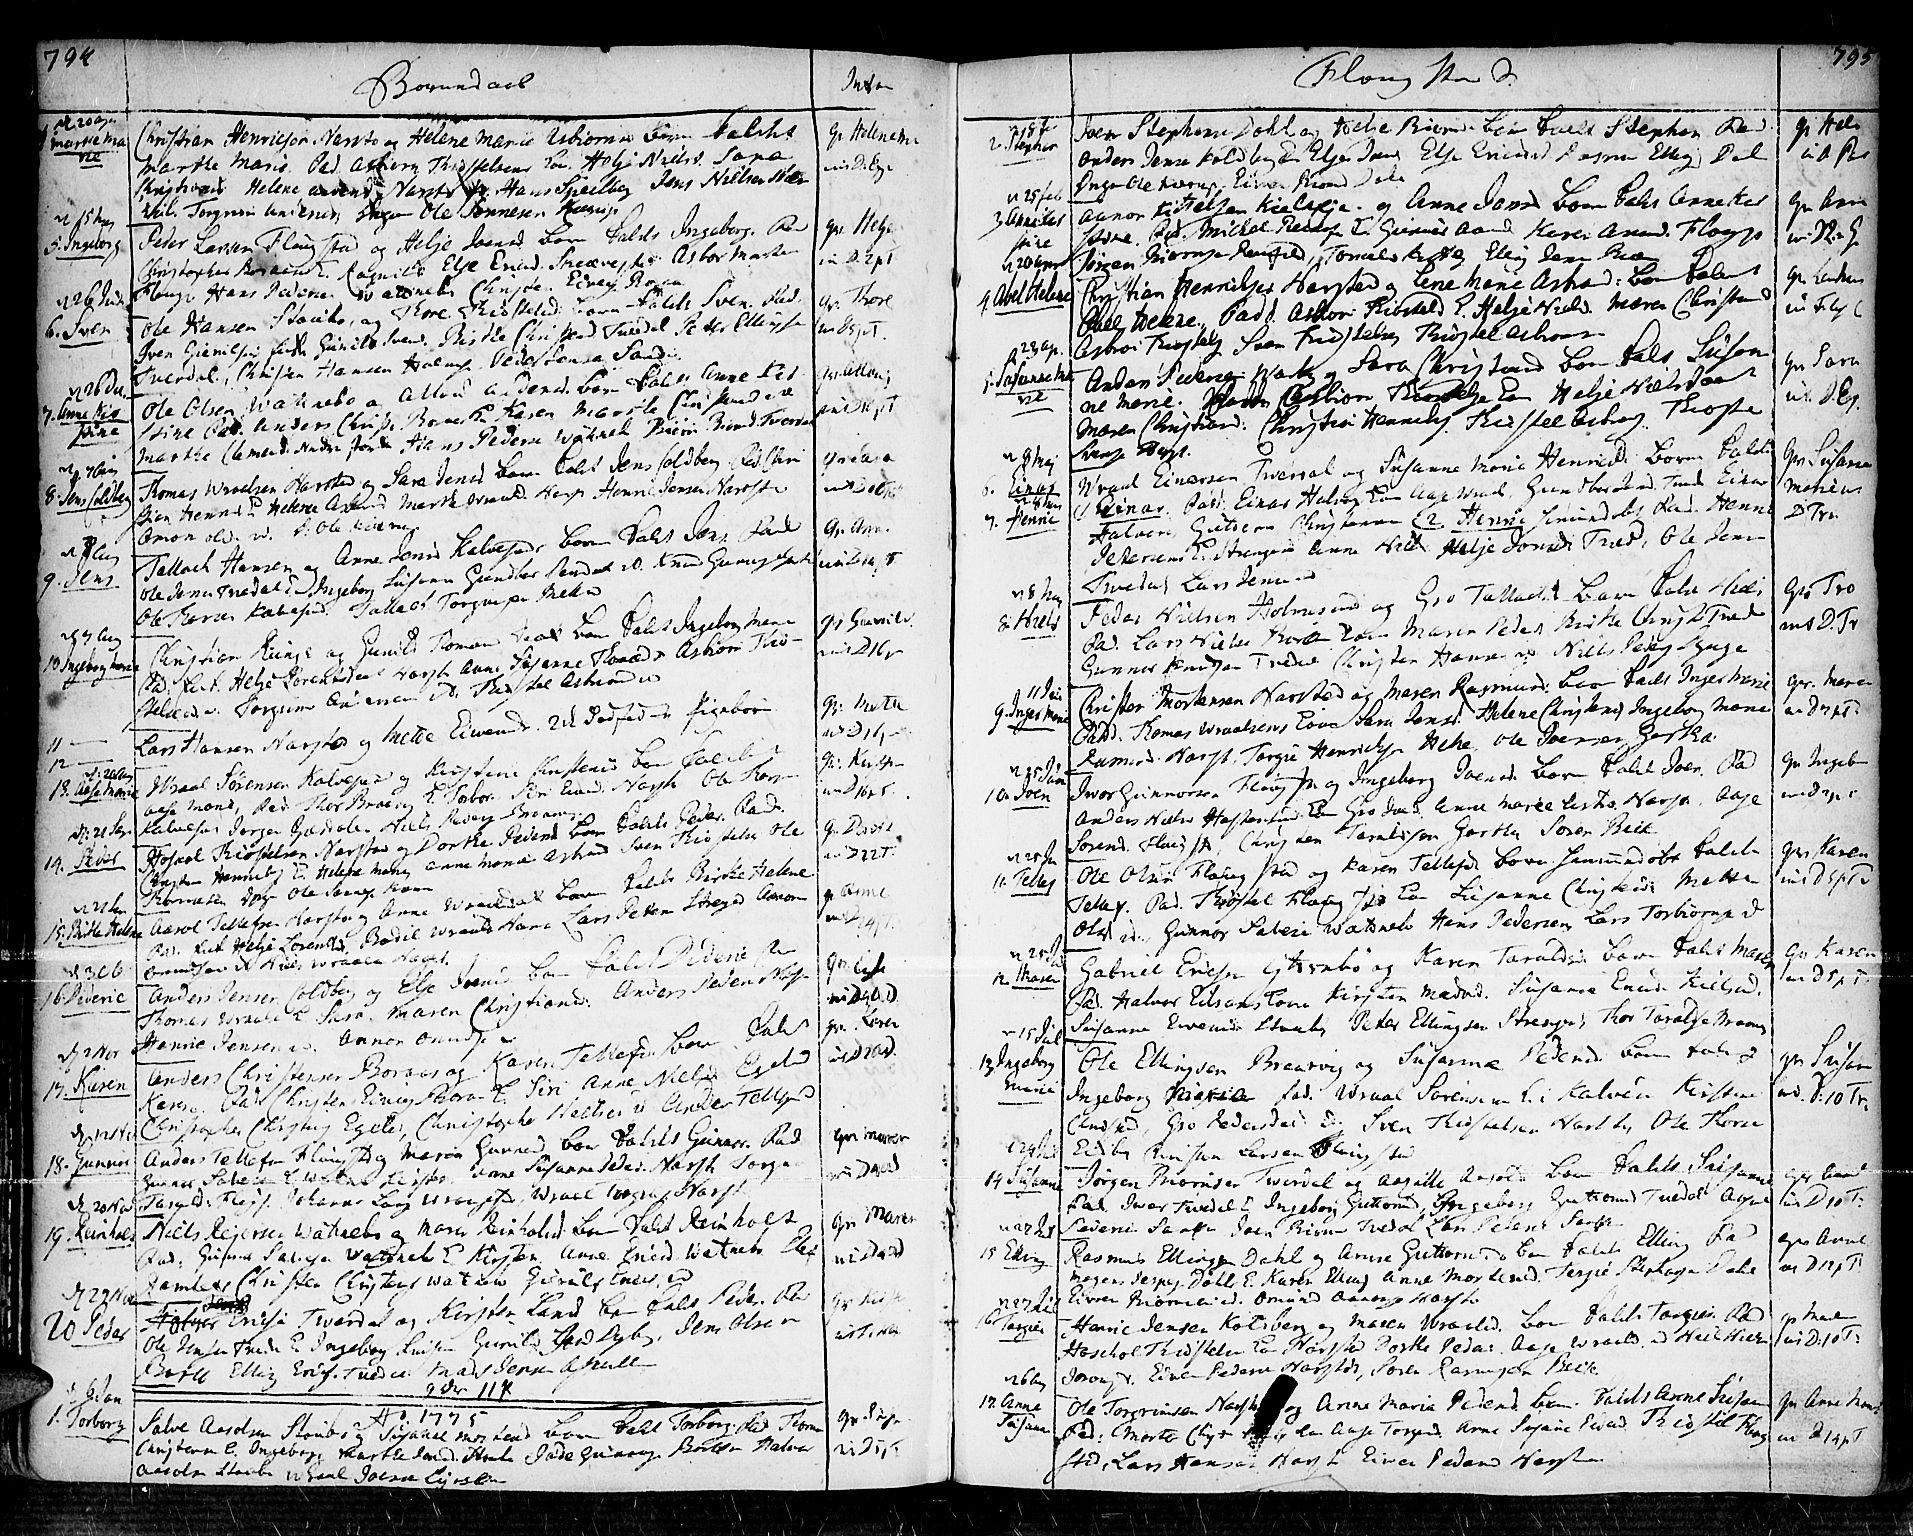 SAK, Dypvåg sokneprestkontor, F/Fa/Faa/L0001: Ministerialbok nr. A 1 /2, 1765-1798, s. 794-795